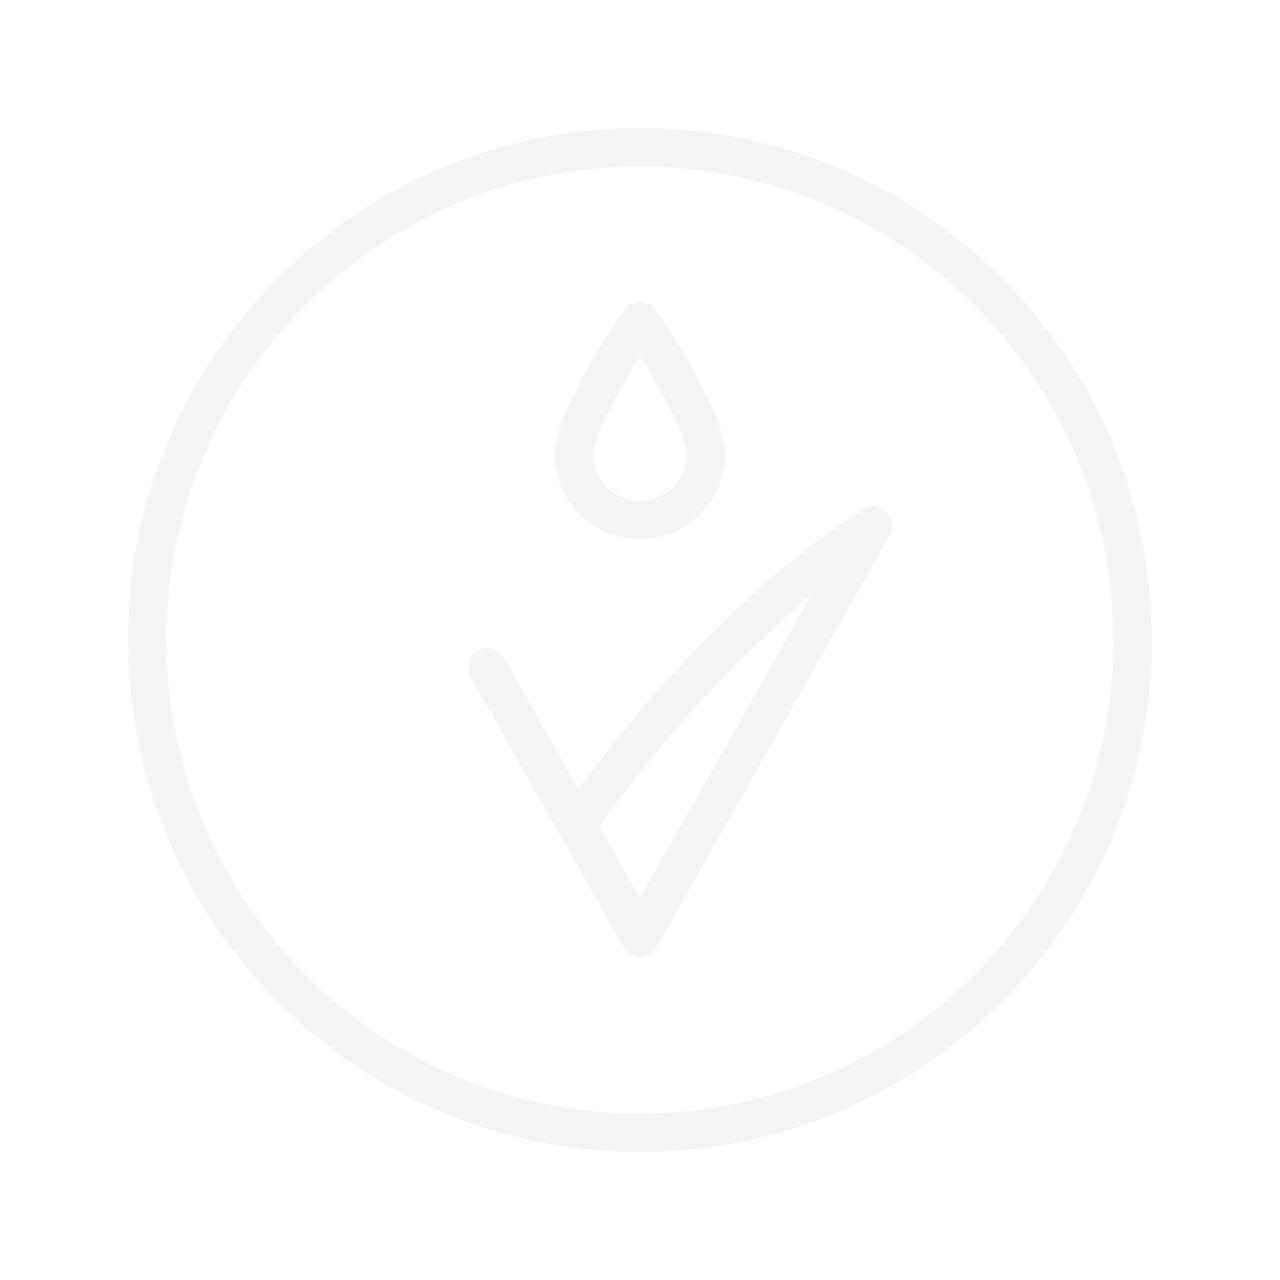 BVLGARI Man In Black Shampoo & Shower Gel 200ml